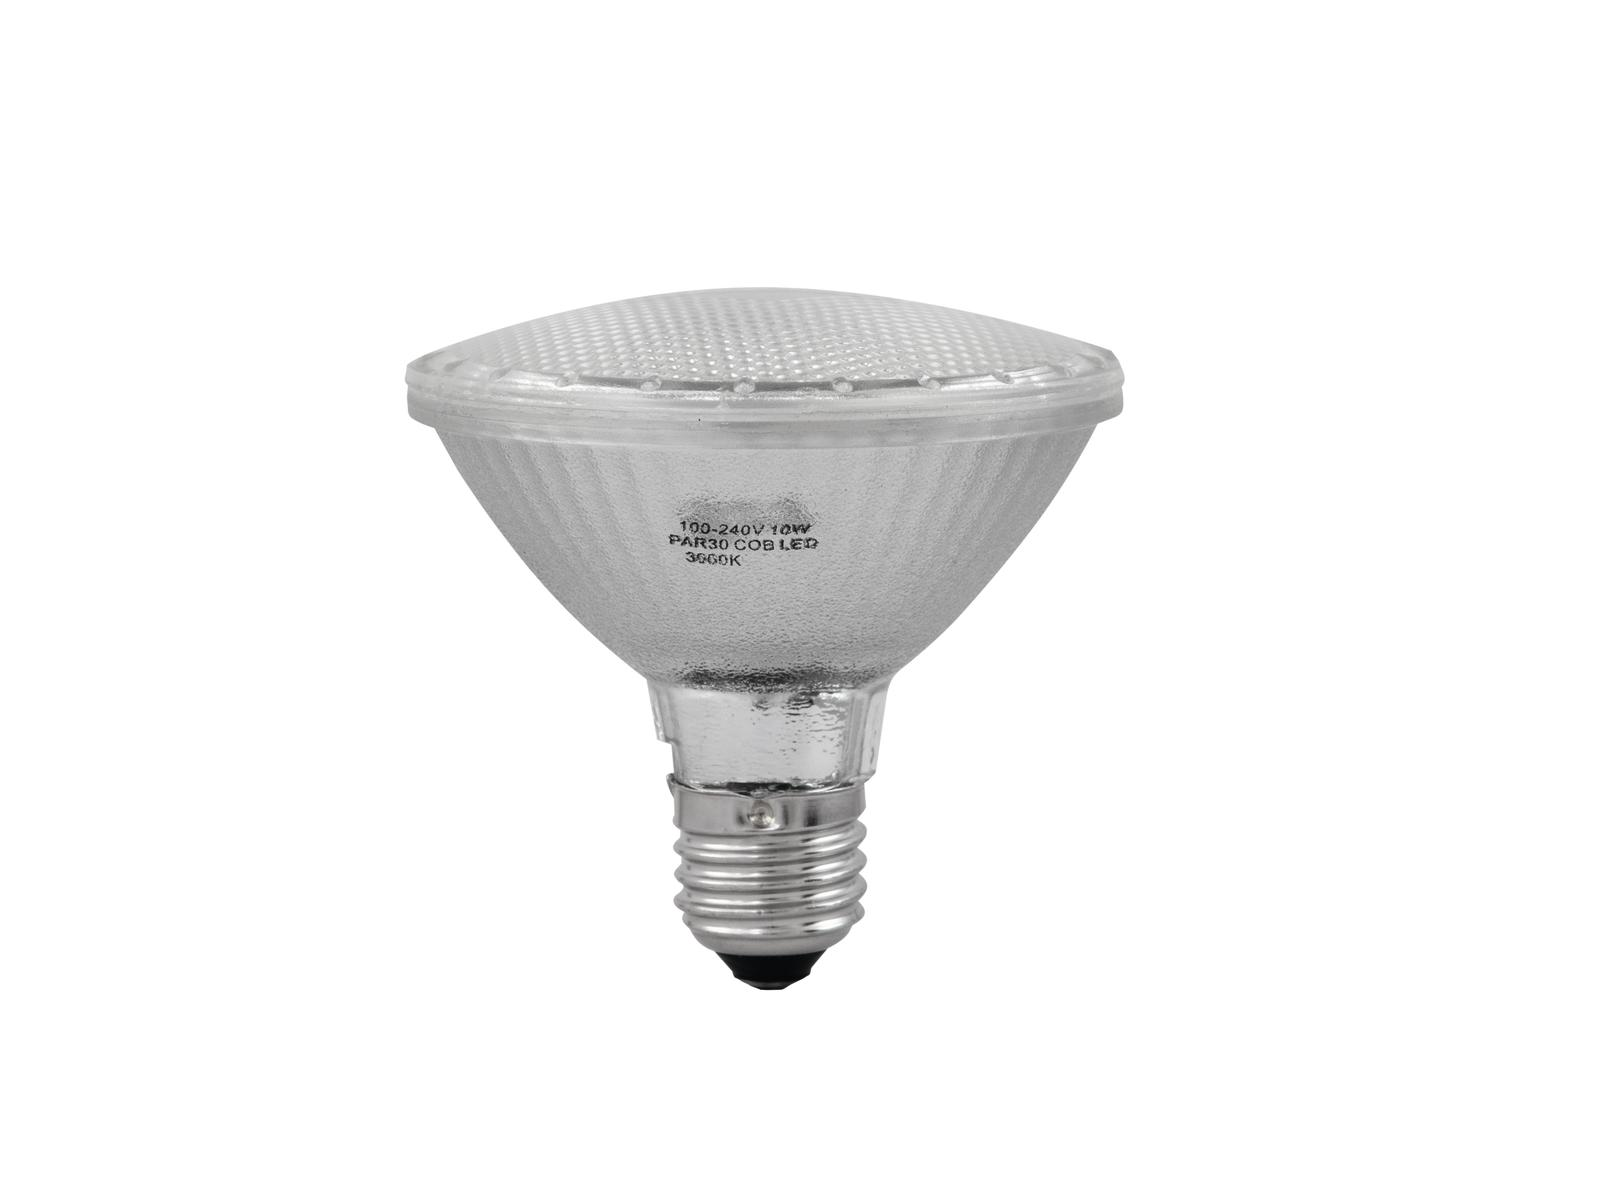 Lampada Faro Per PAR-30 a LED 3000K Attacco E-27  230V SMD OMNILUX